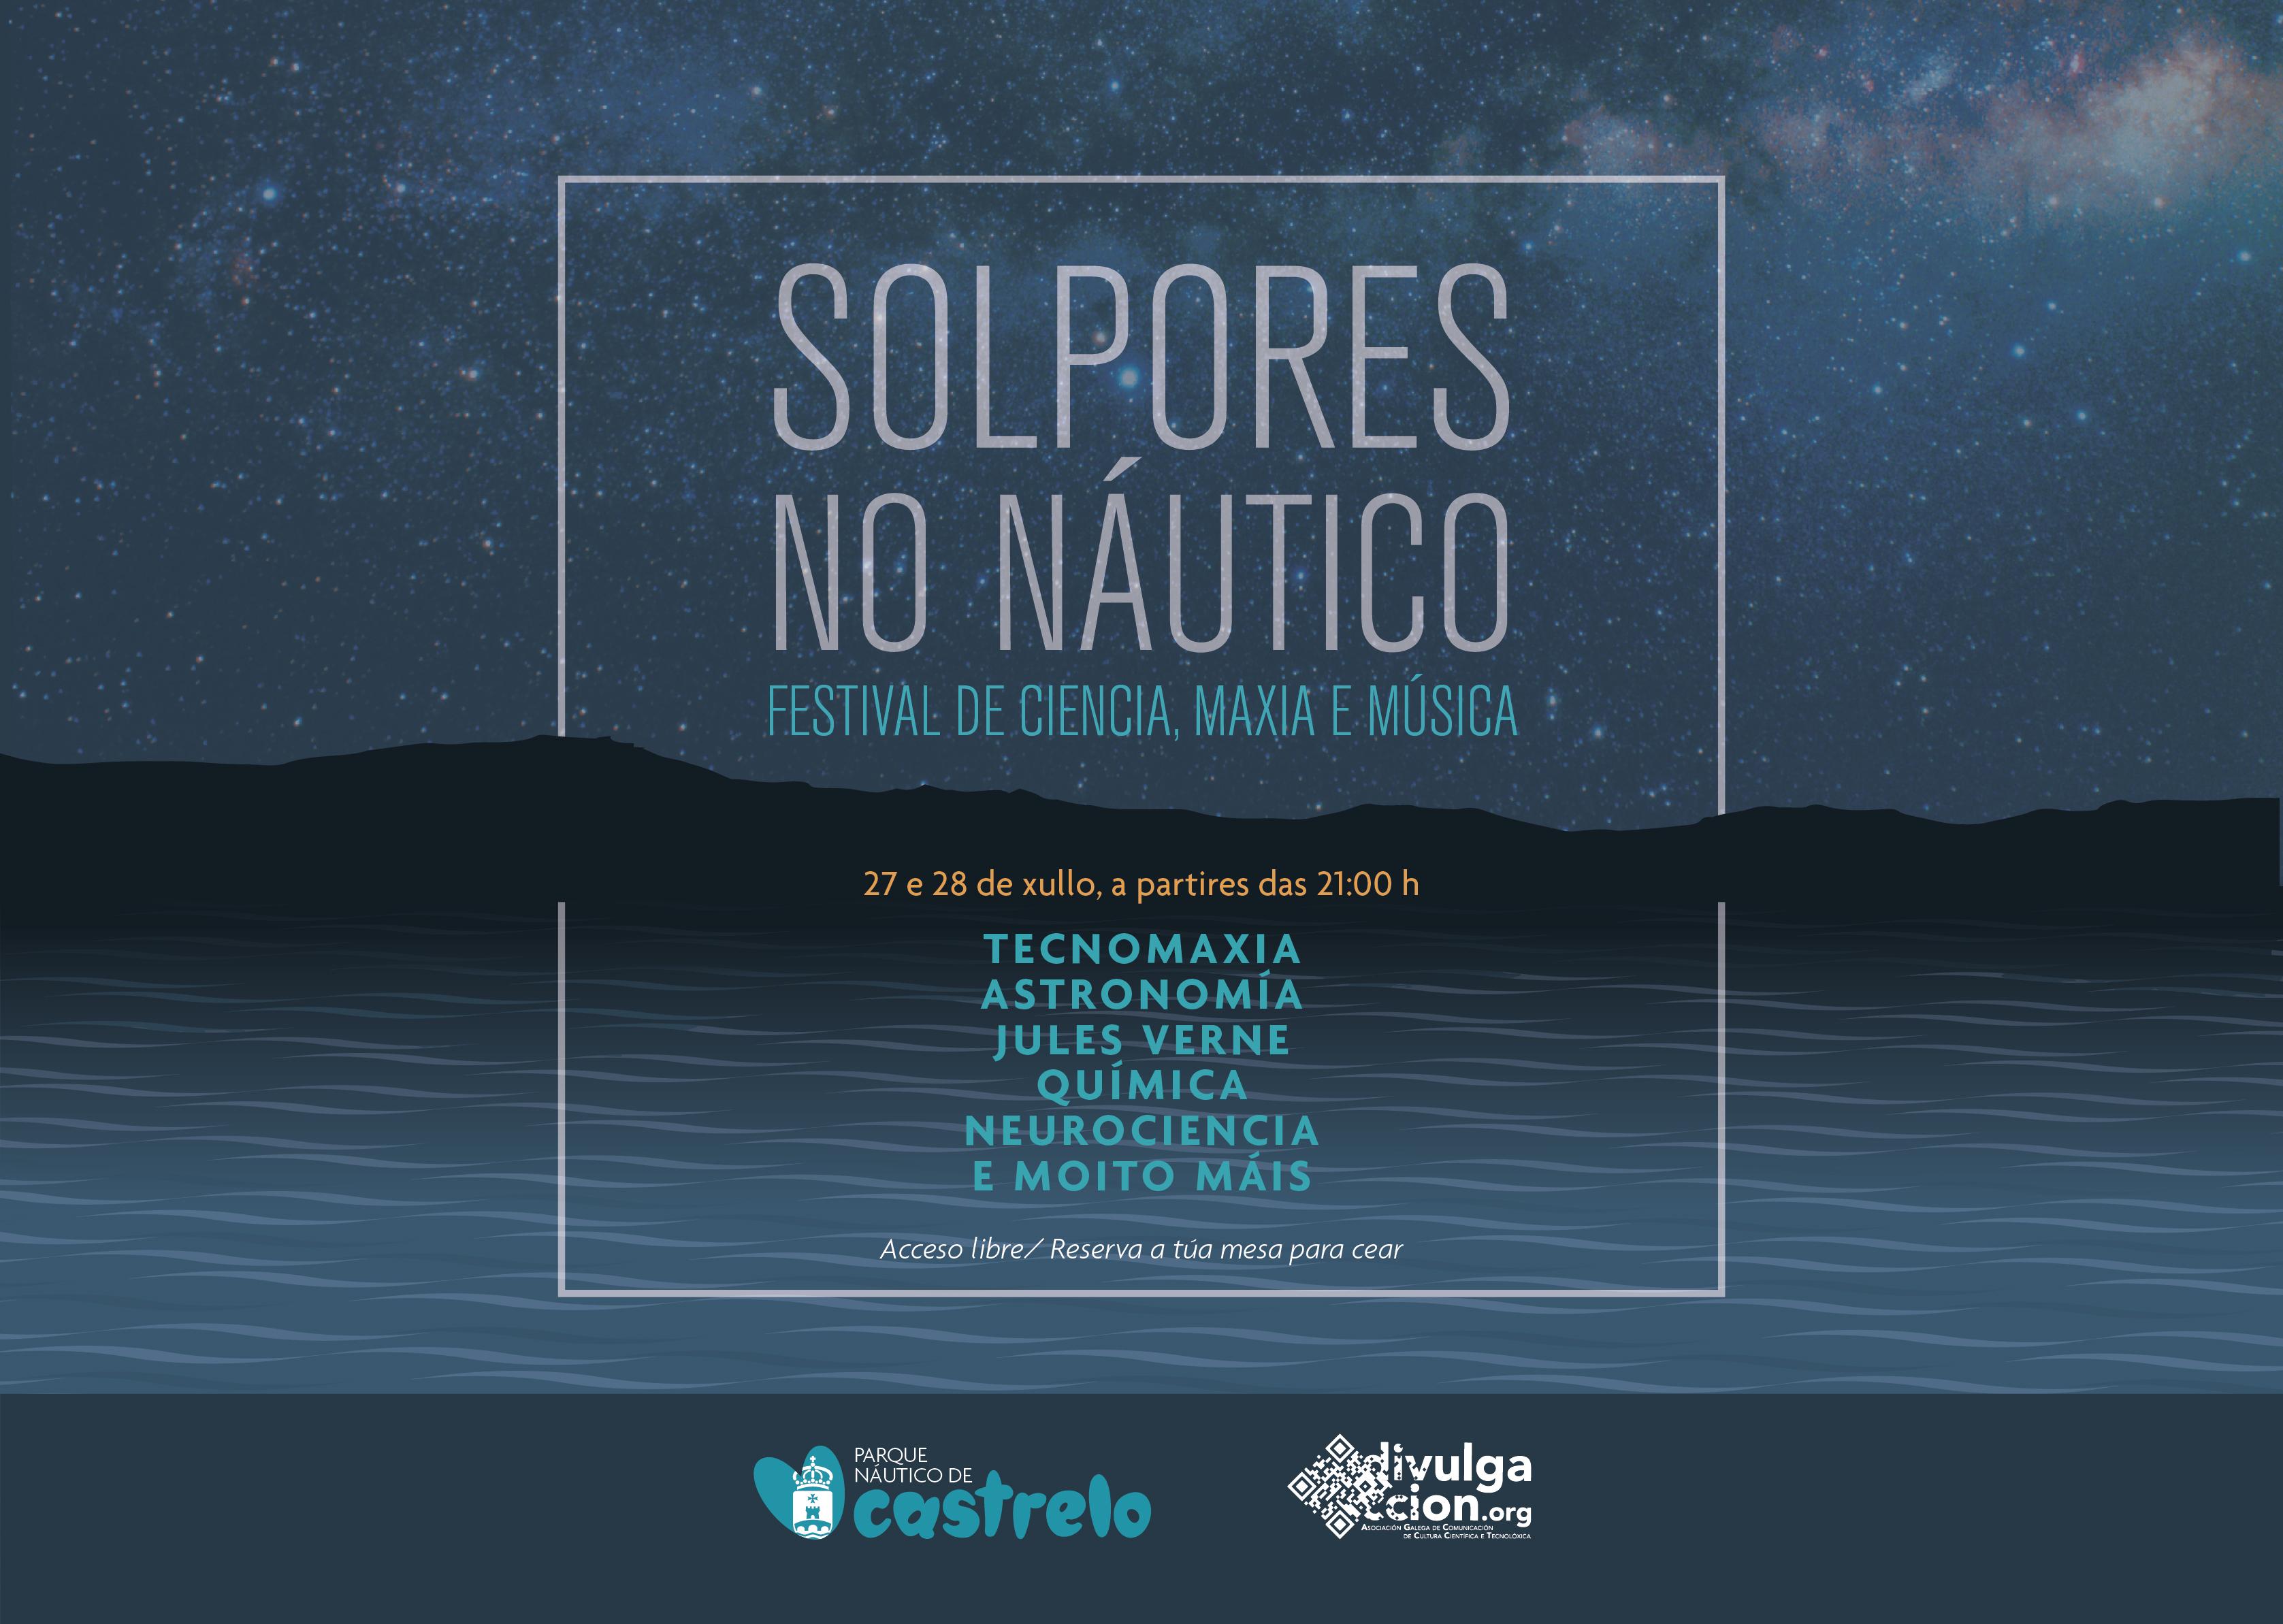 Solpores no Náutico: Festival de ciencia, maxia e música